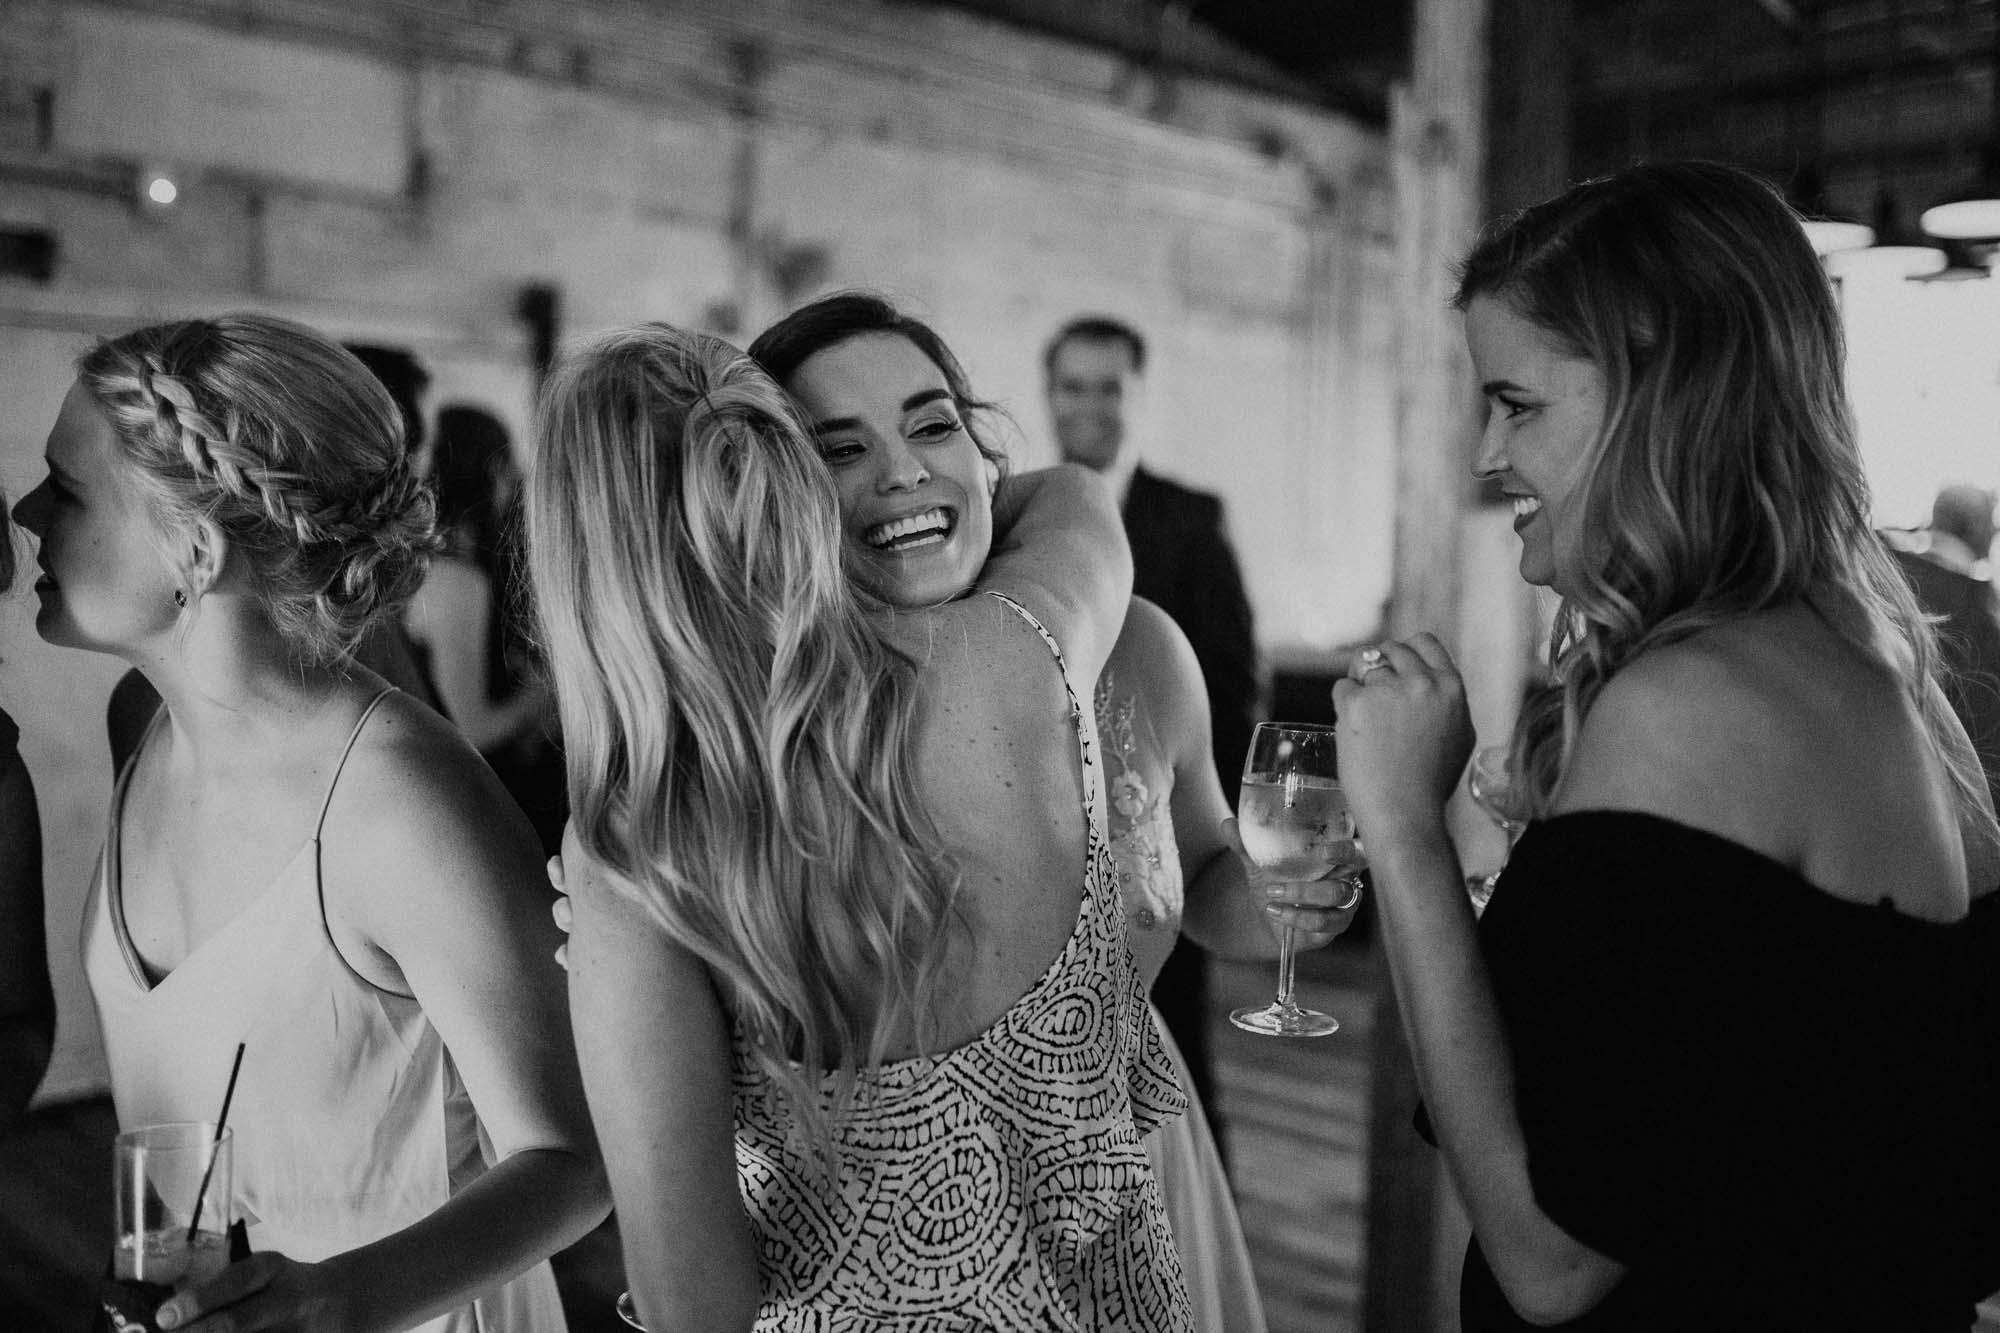 journeyman_distillery_wedding_photographer_chicago_il_wright_photographs-4868.jpg